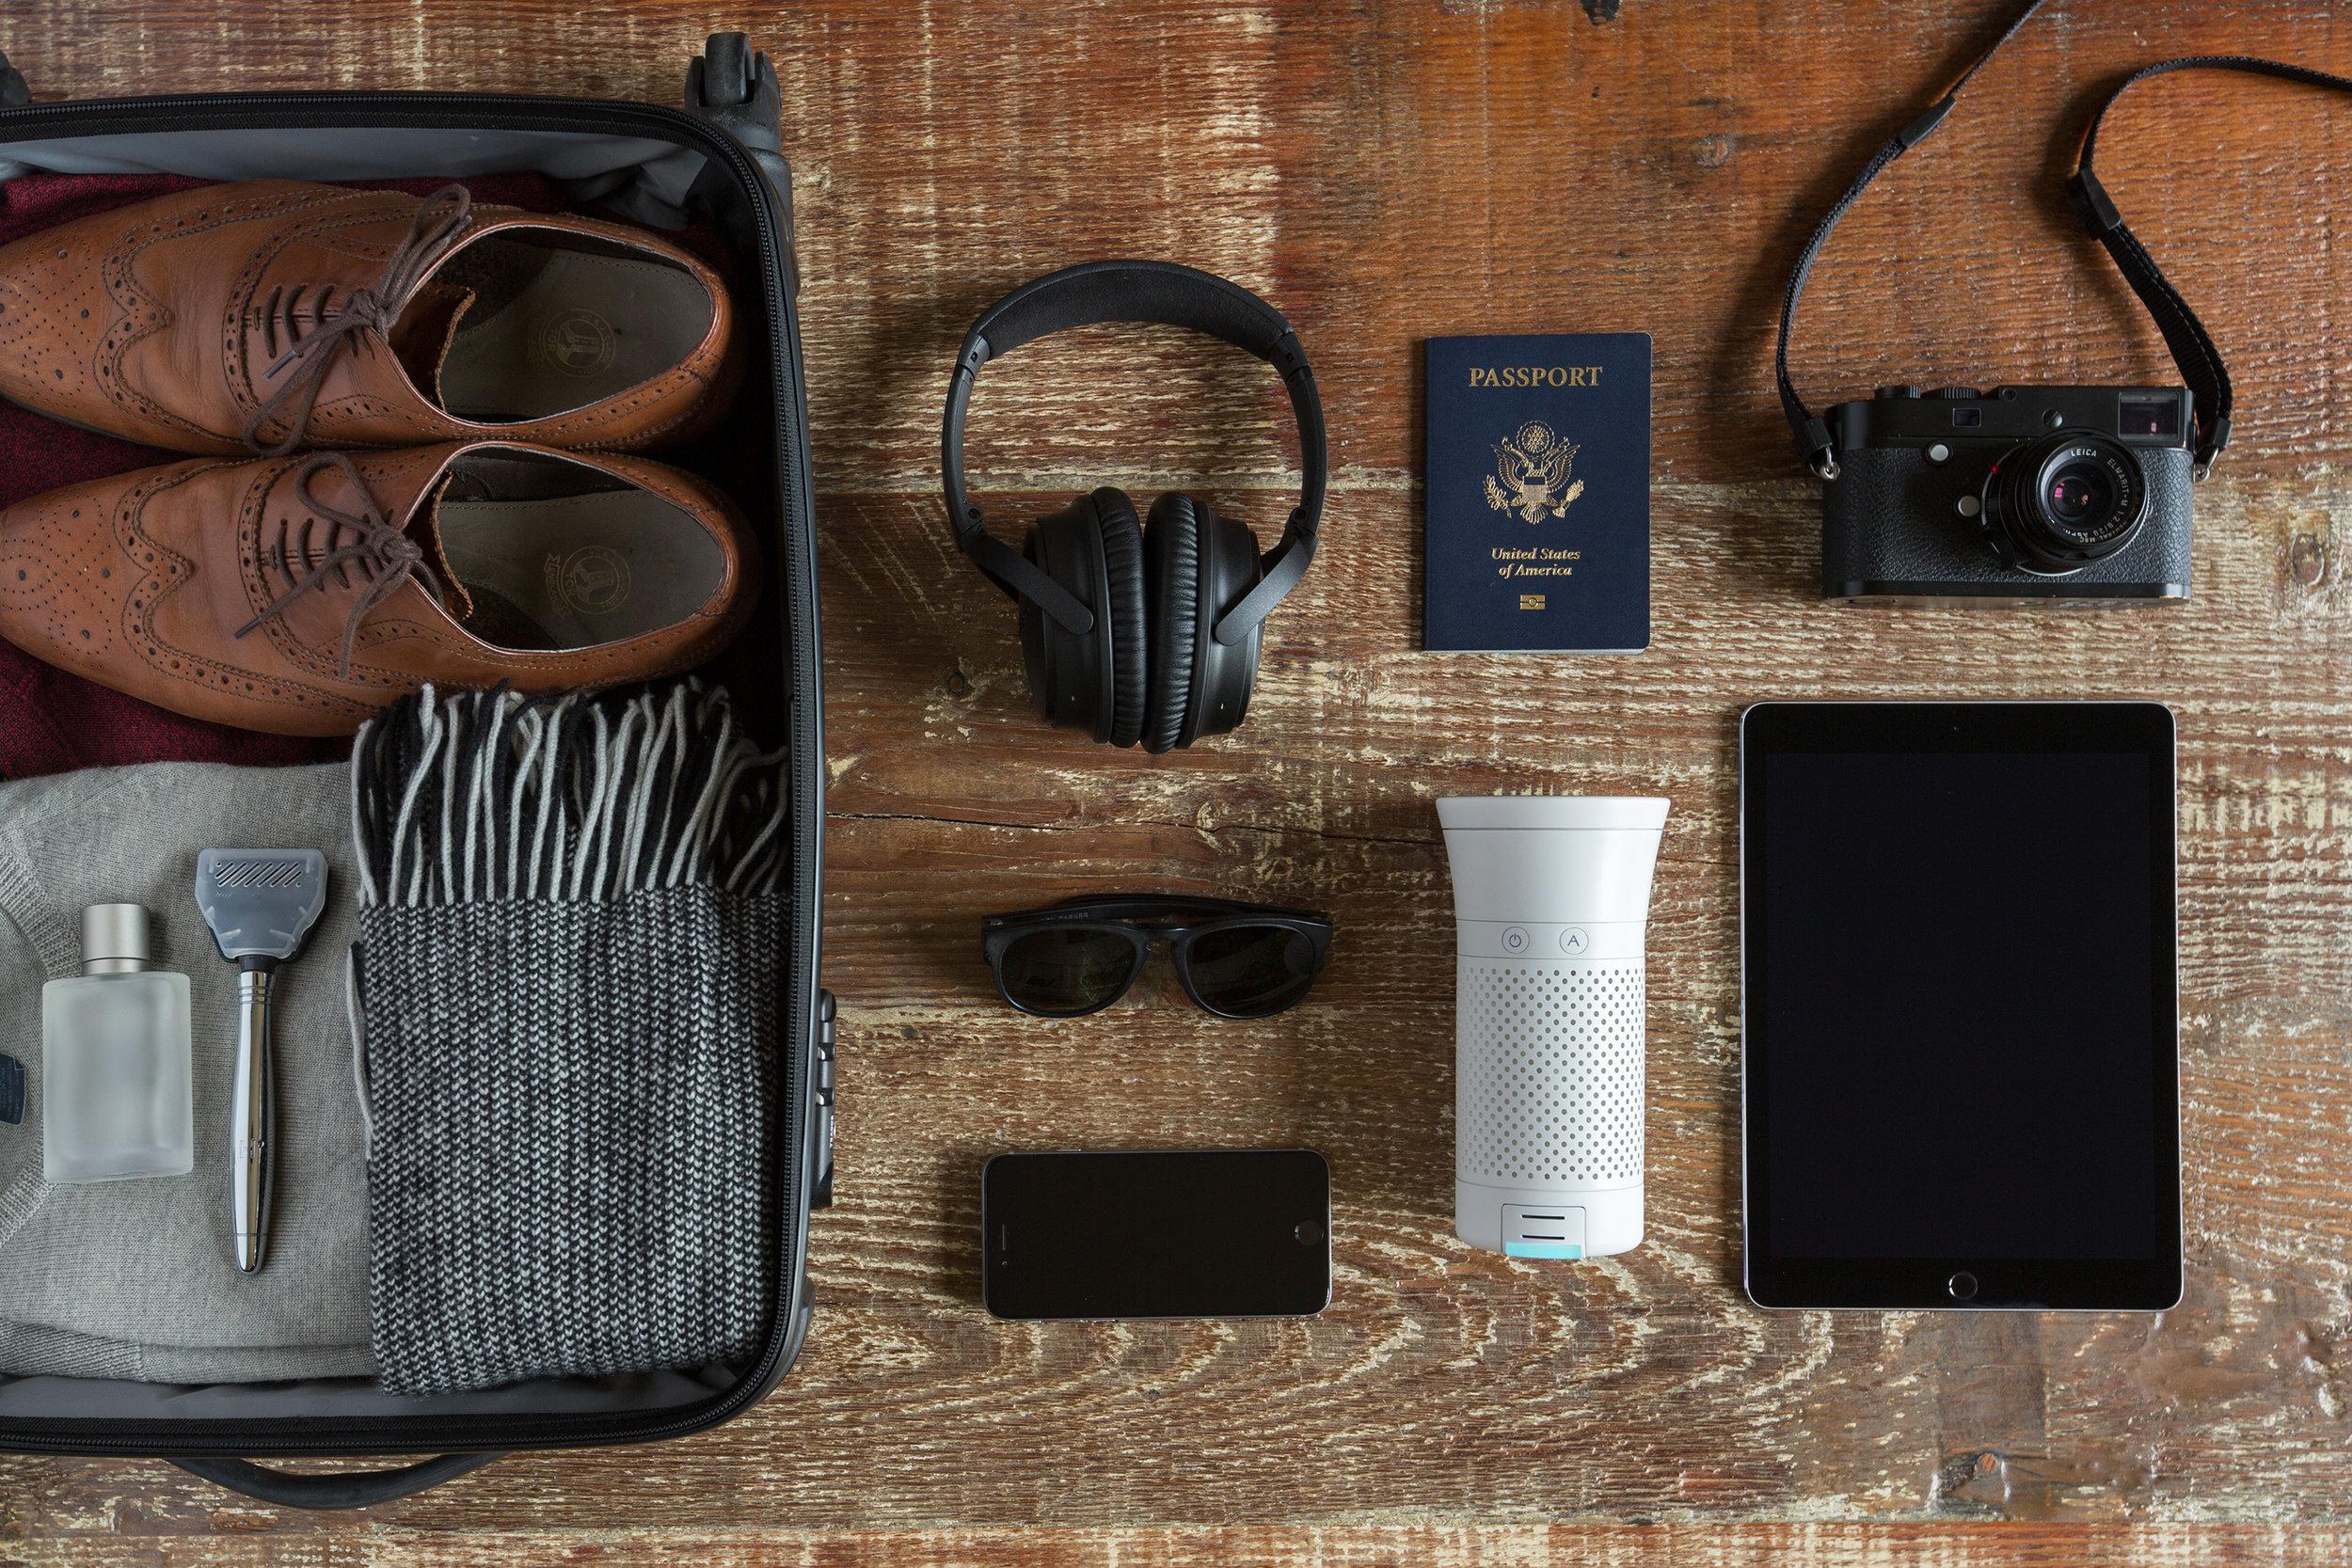 wynd_with_travel_items.jpg